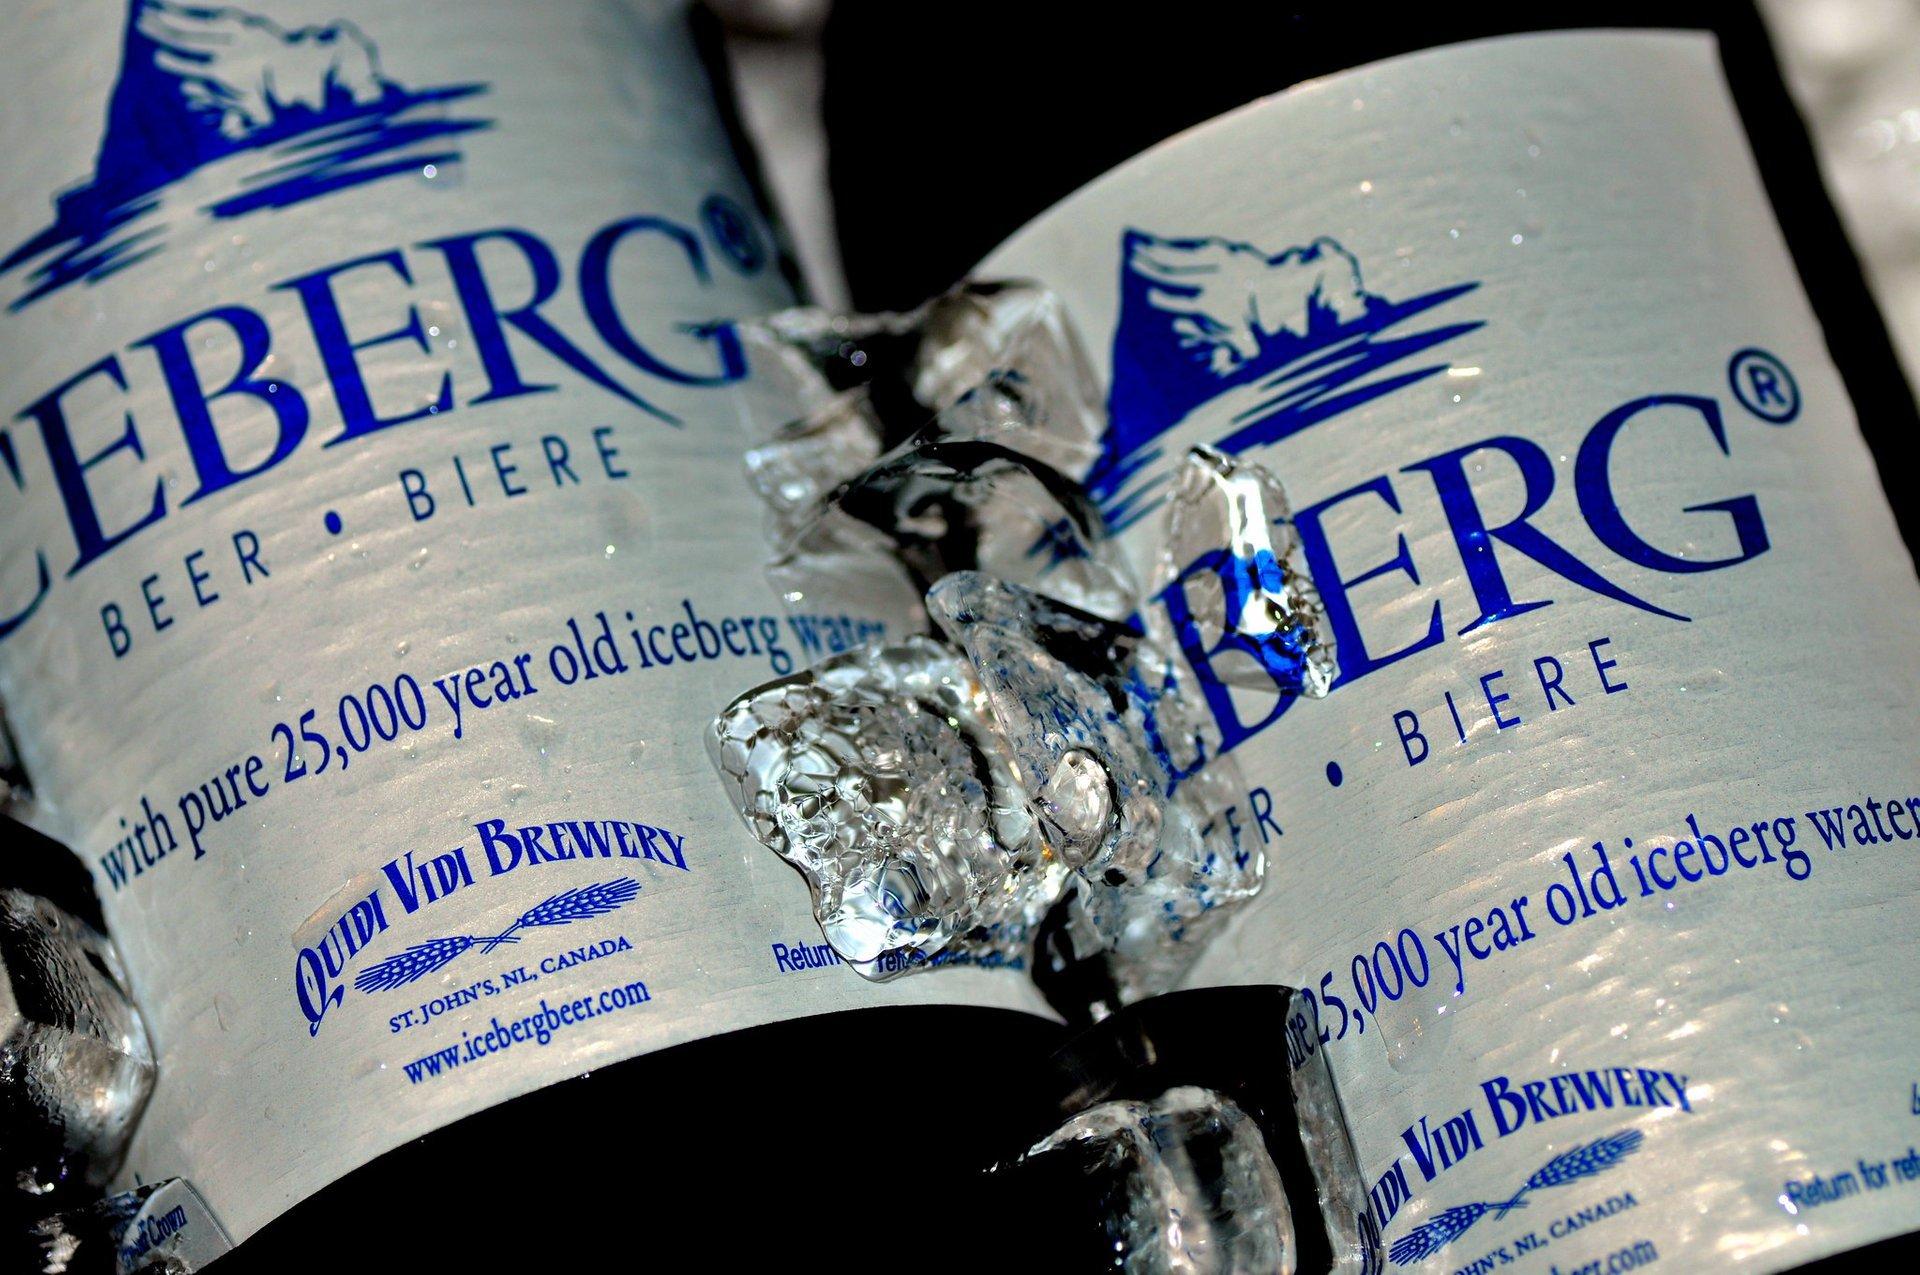 Iceberg Beer in Newfoundland and Labrador 2020 - Best Time